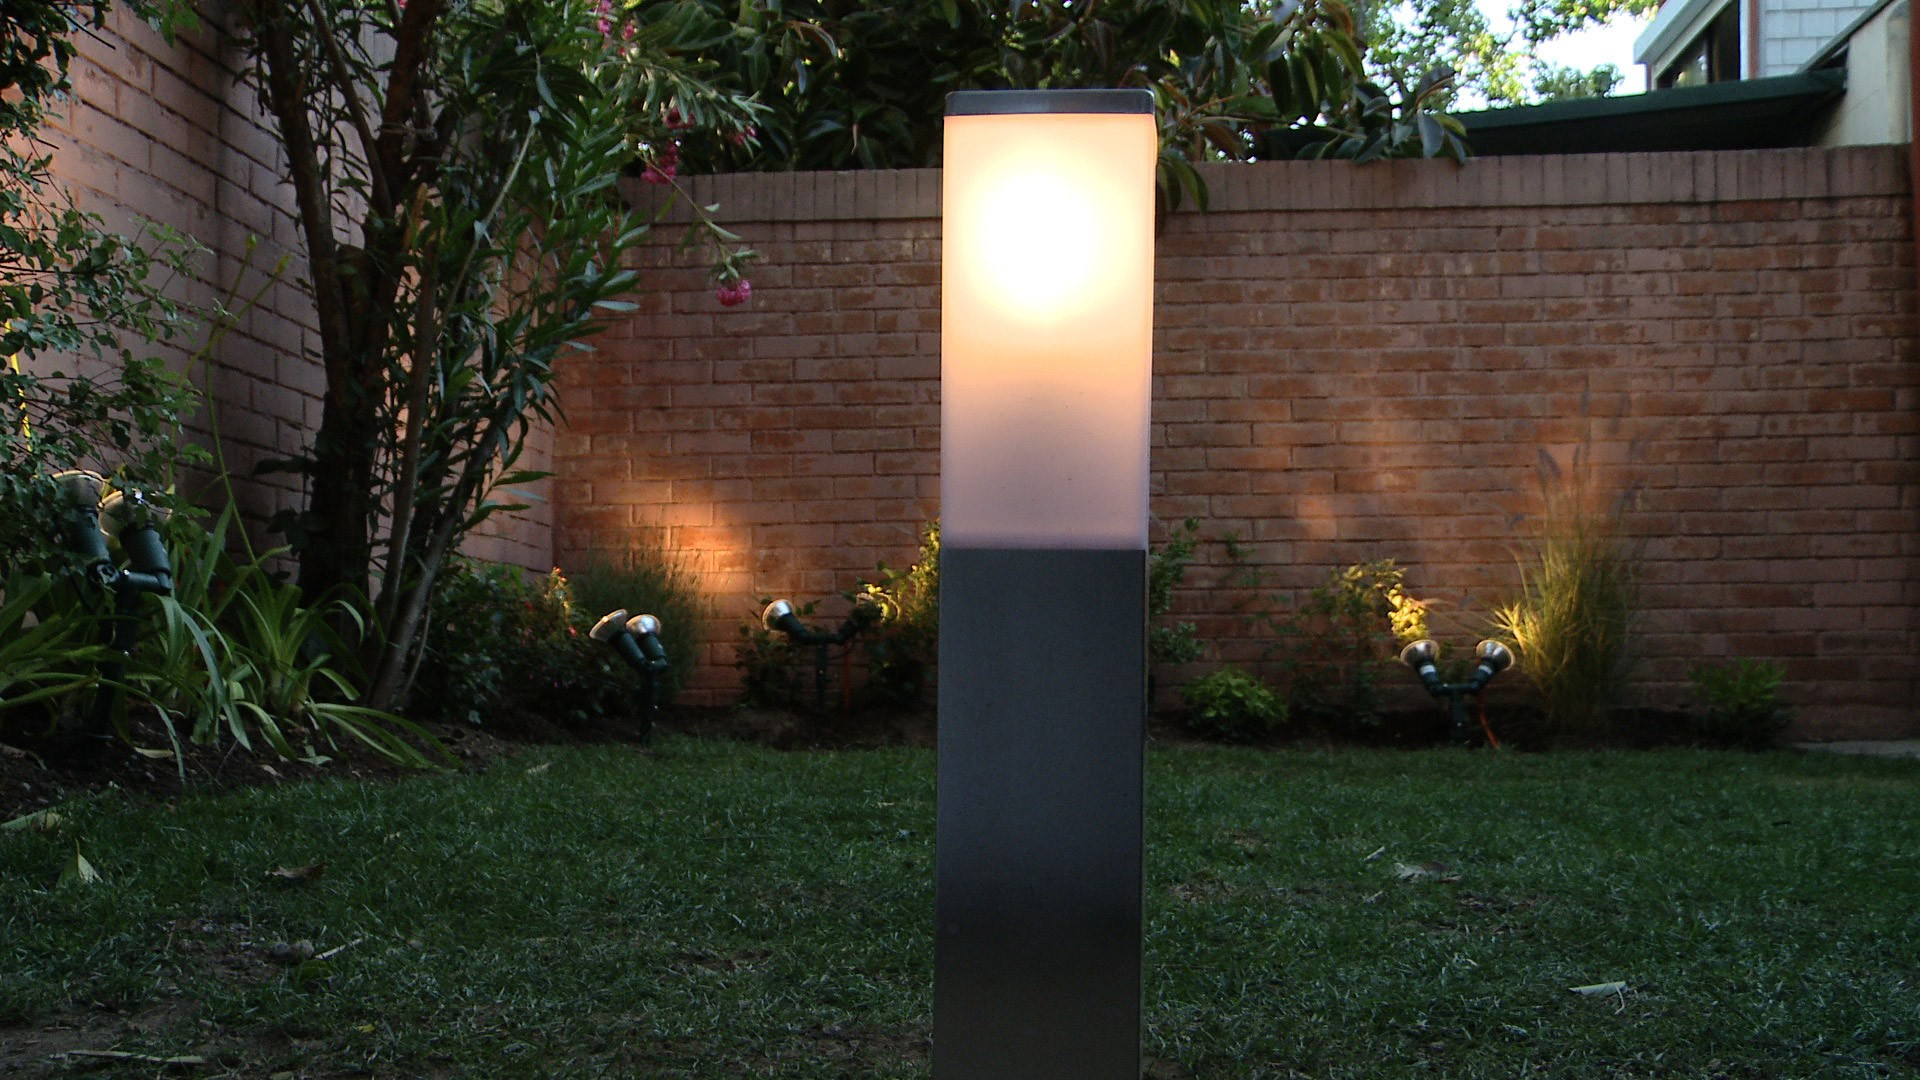 iluminacion jardines leds a favor de cautivador hagalo usted mismo cc2b3mo instalar luces en el jardc2adn idea para iluminacion jardines leds